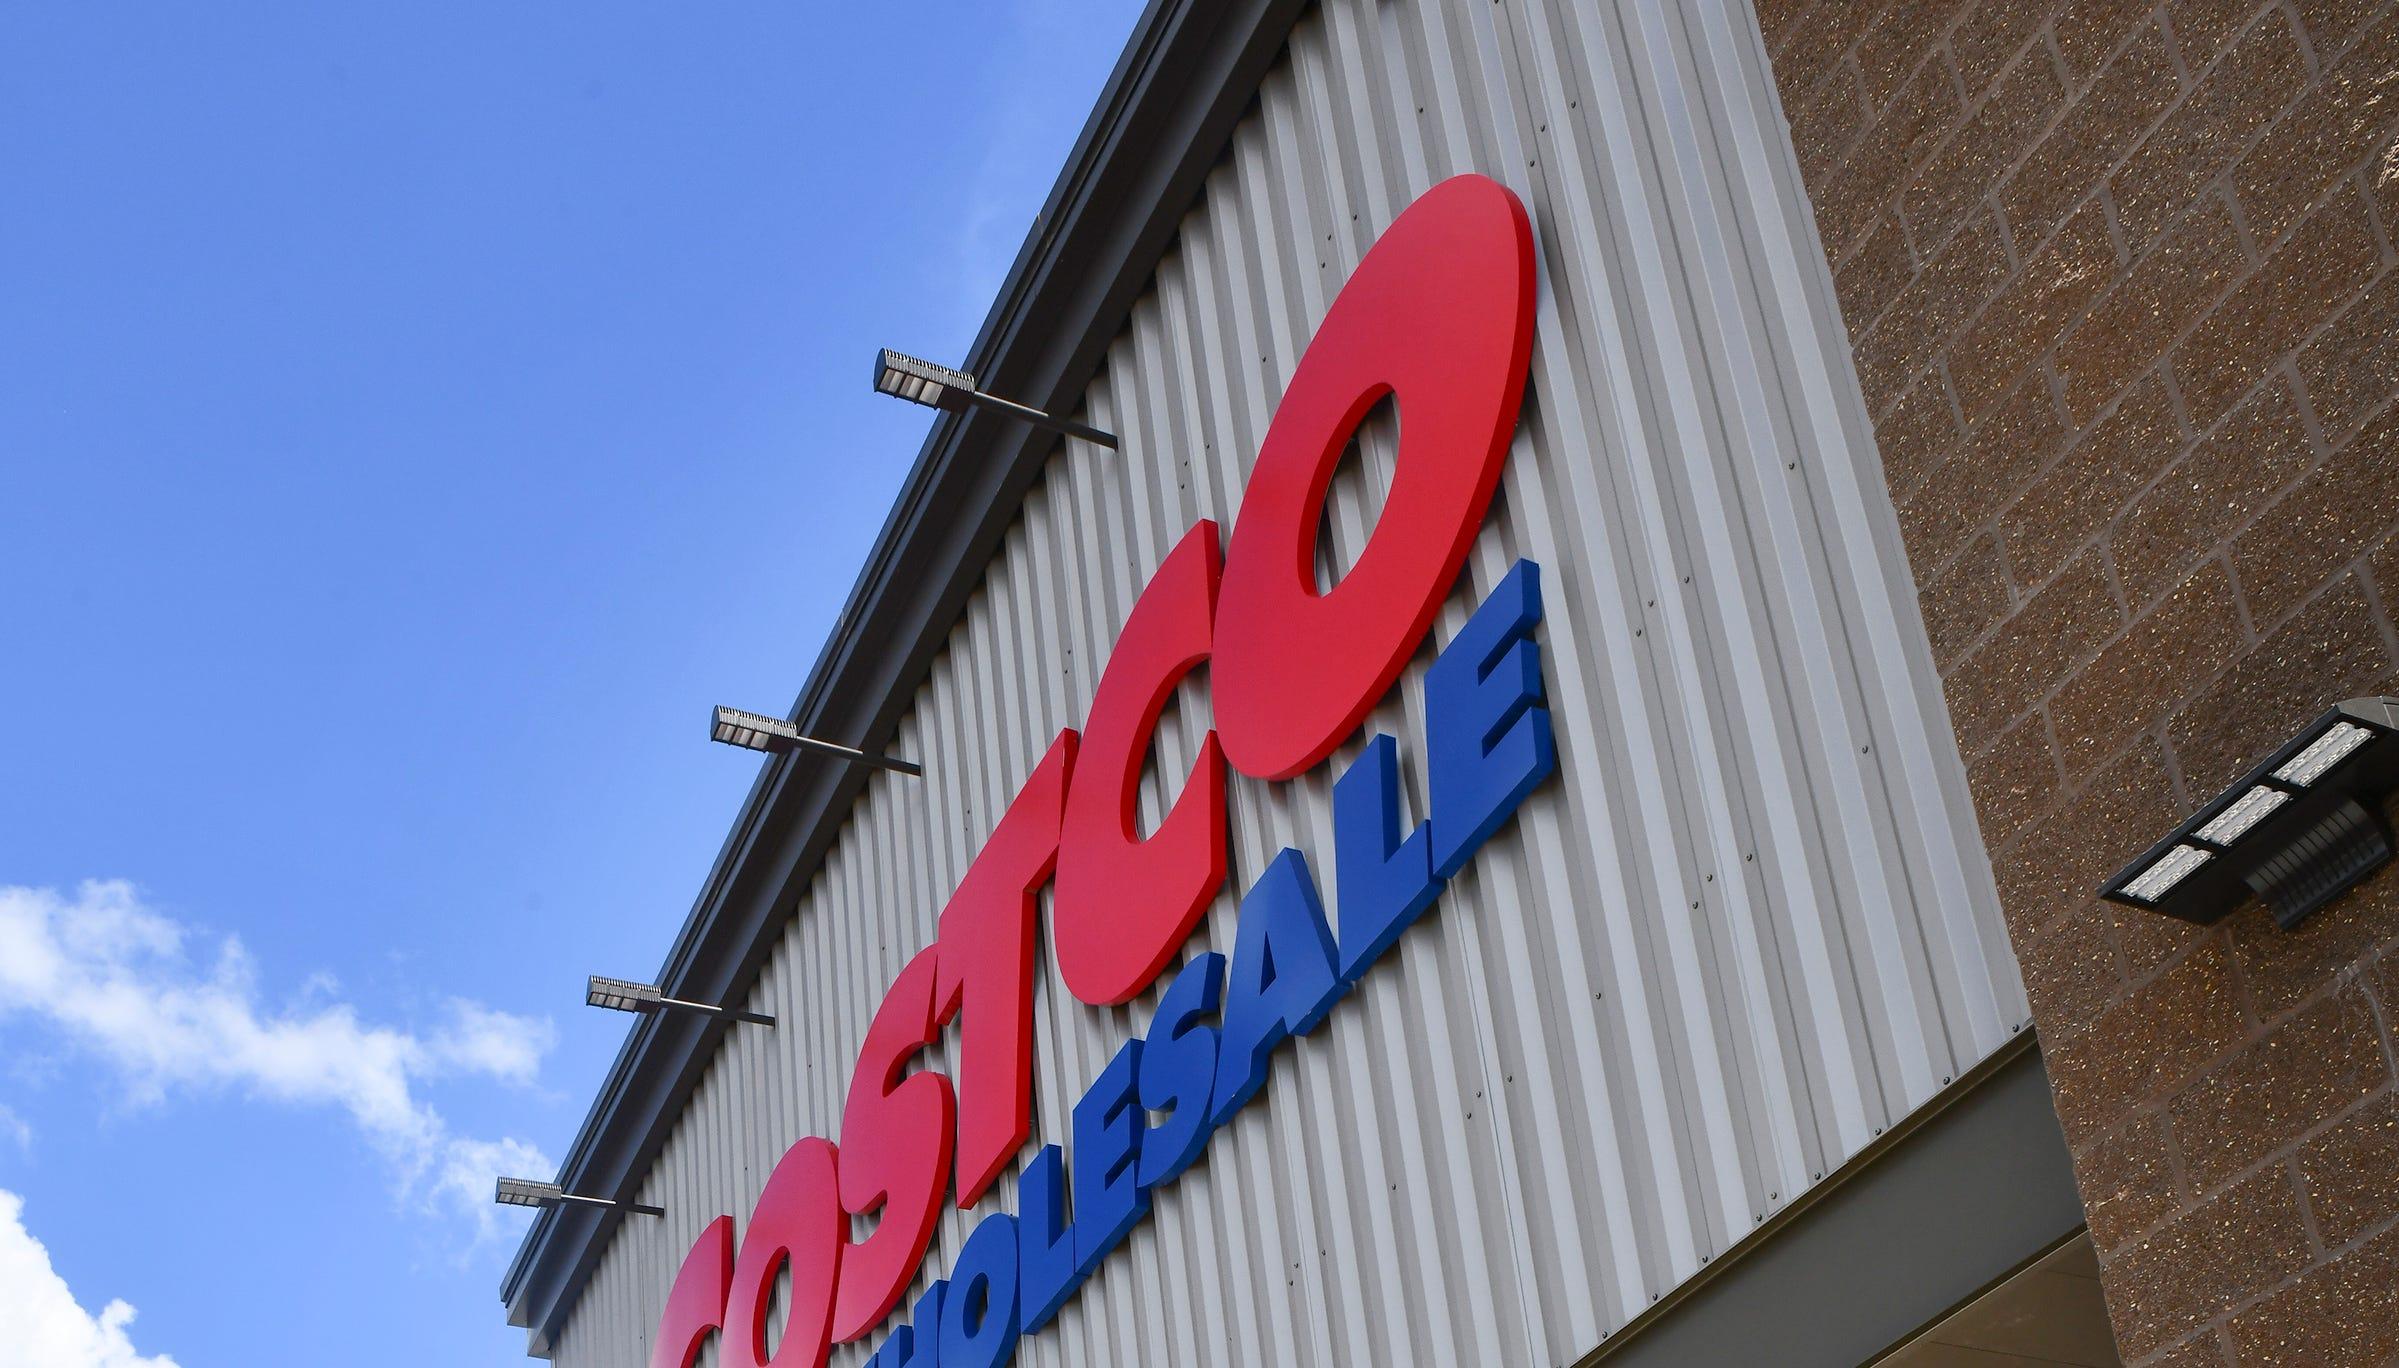 Judge dismisses lawsuit against St. Cloud, Costco on missed deadline